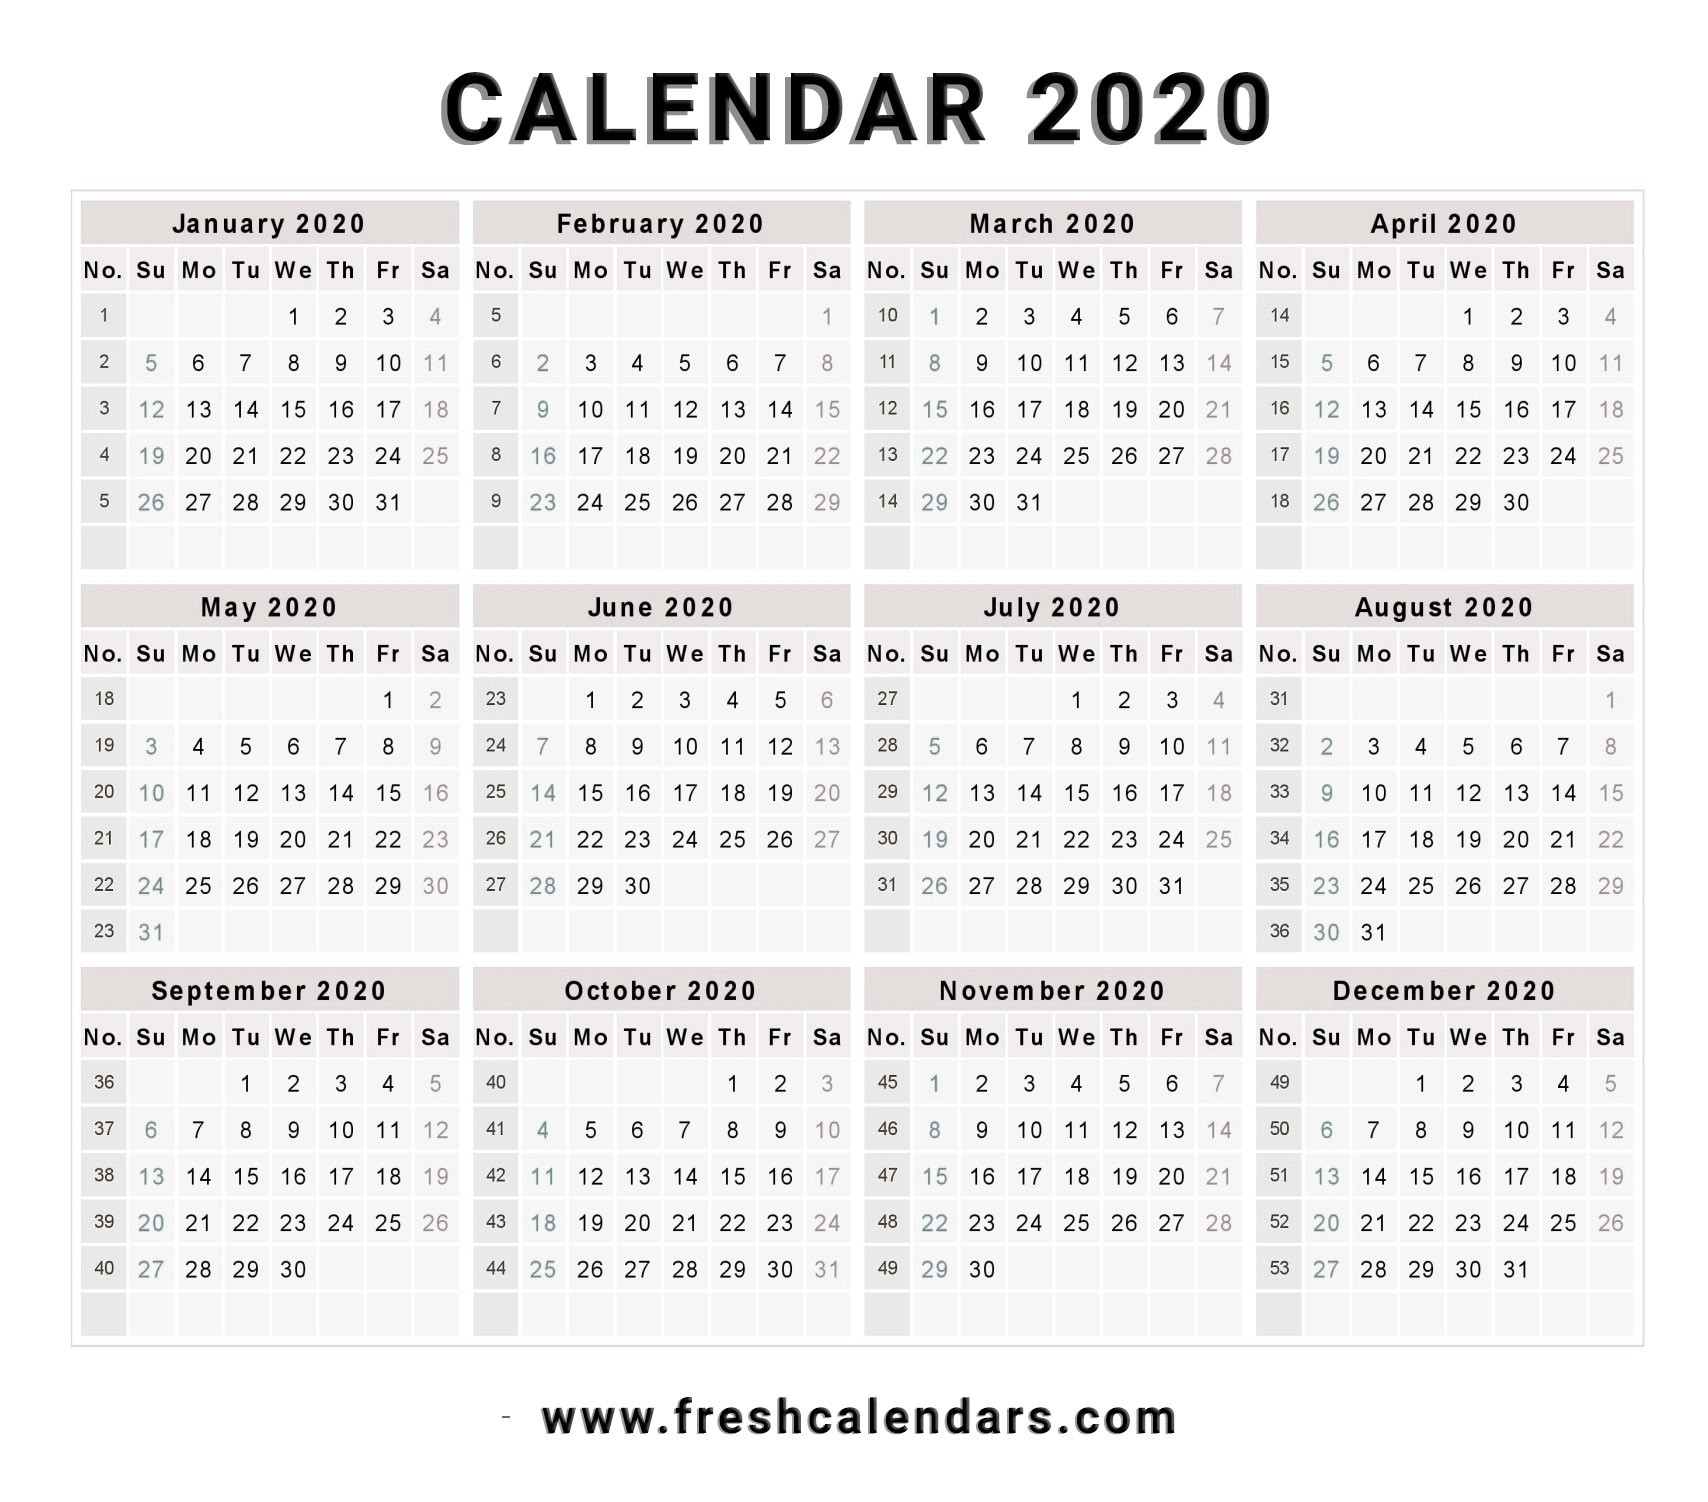 2020 Calendars To Fill In - Calendar Inspiration Design-Monthly Fill In Calendar 2021